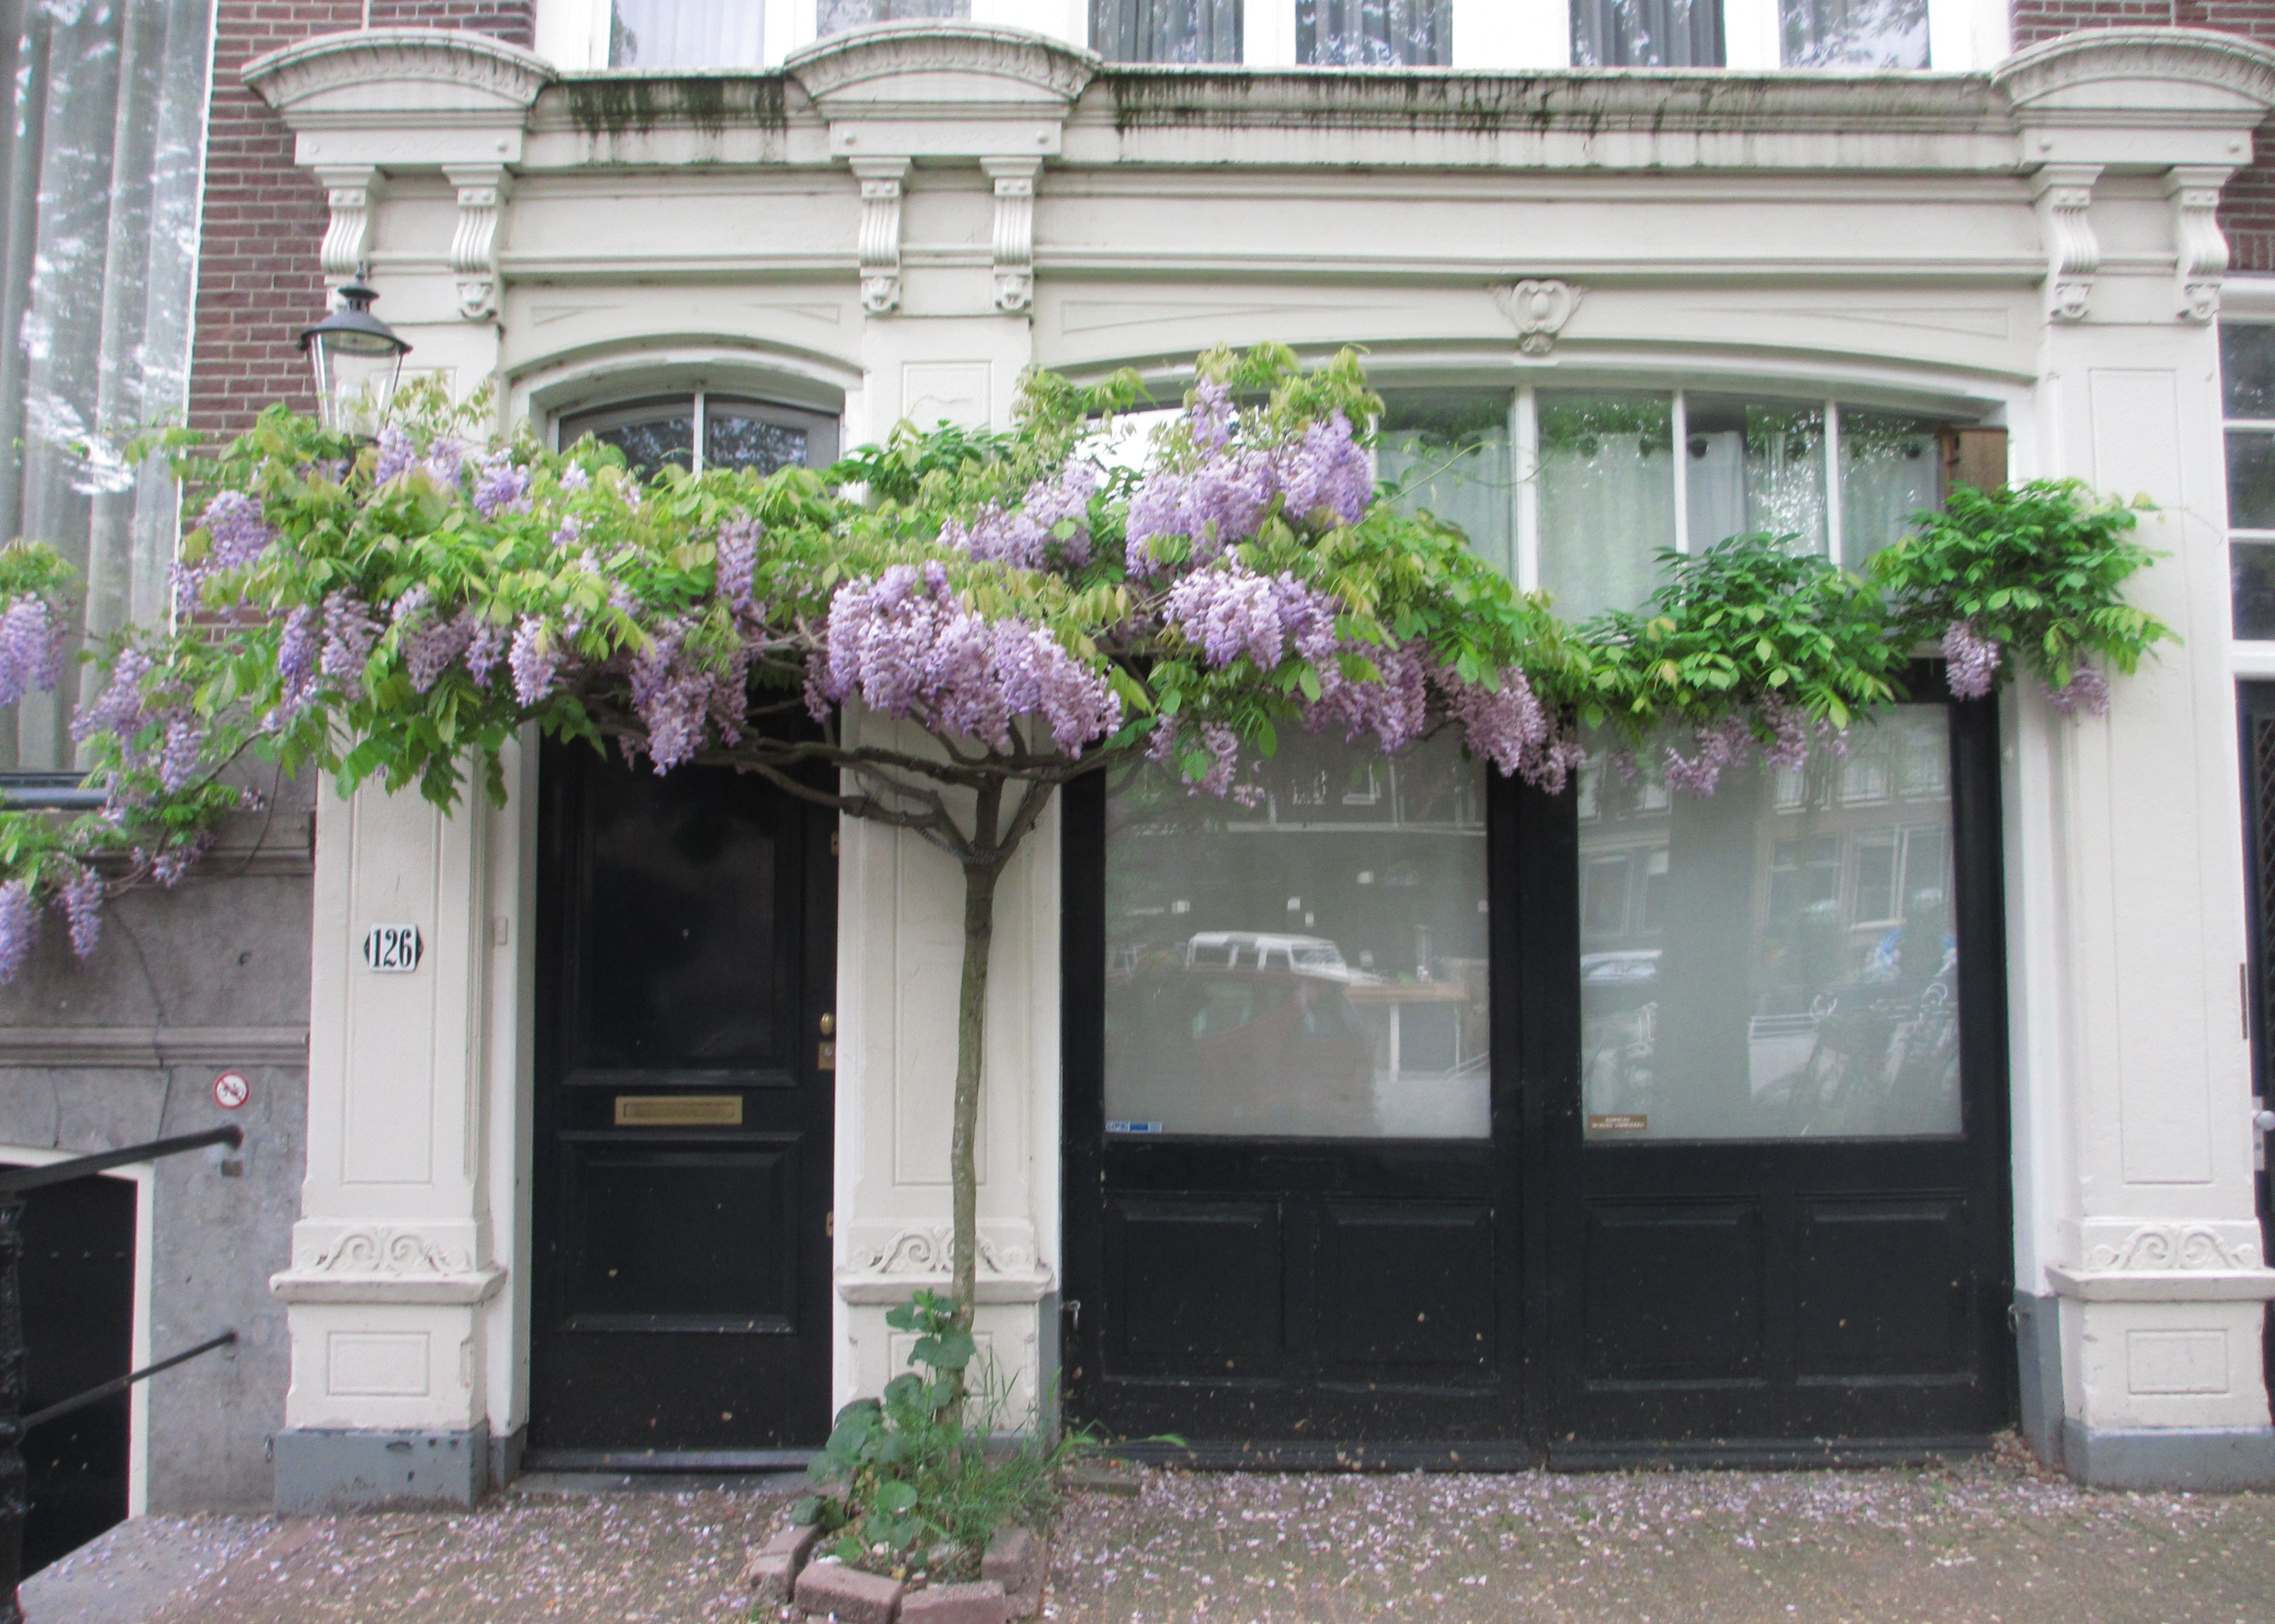 Holland & Magical Doors in Amsterdam | Holland | Pinterest | Amsterdam ... pezcame.com